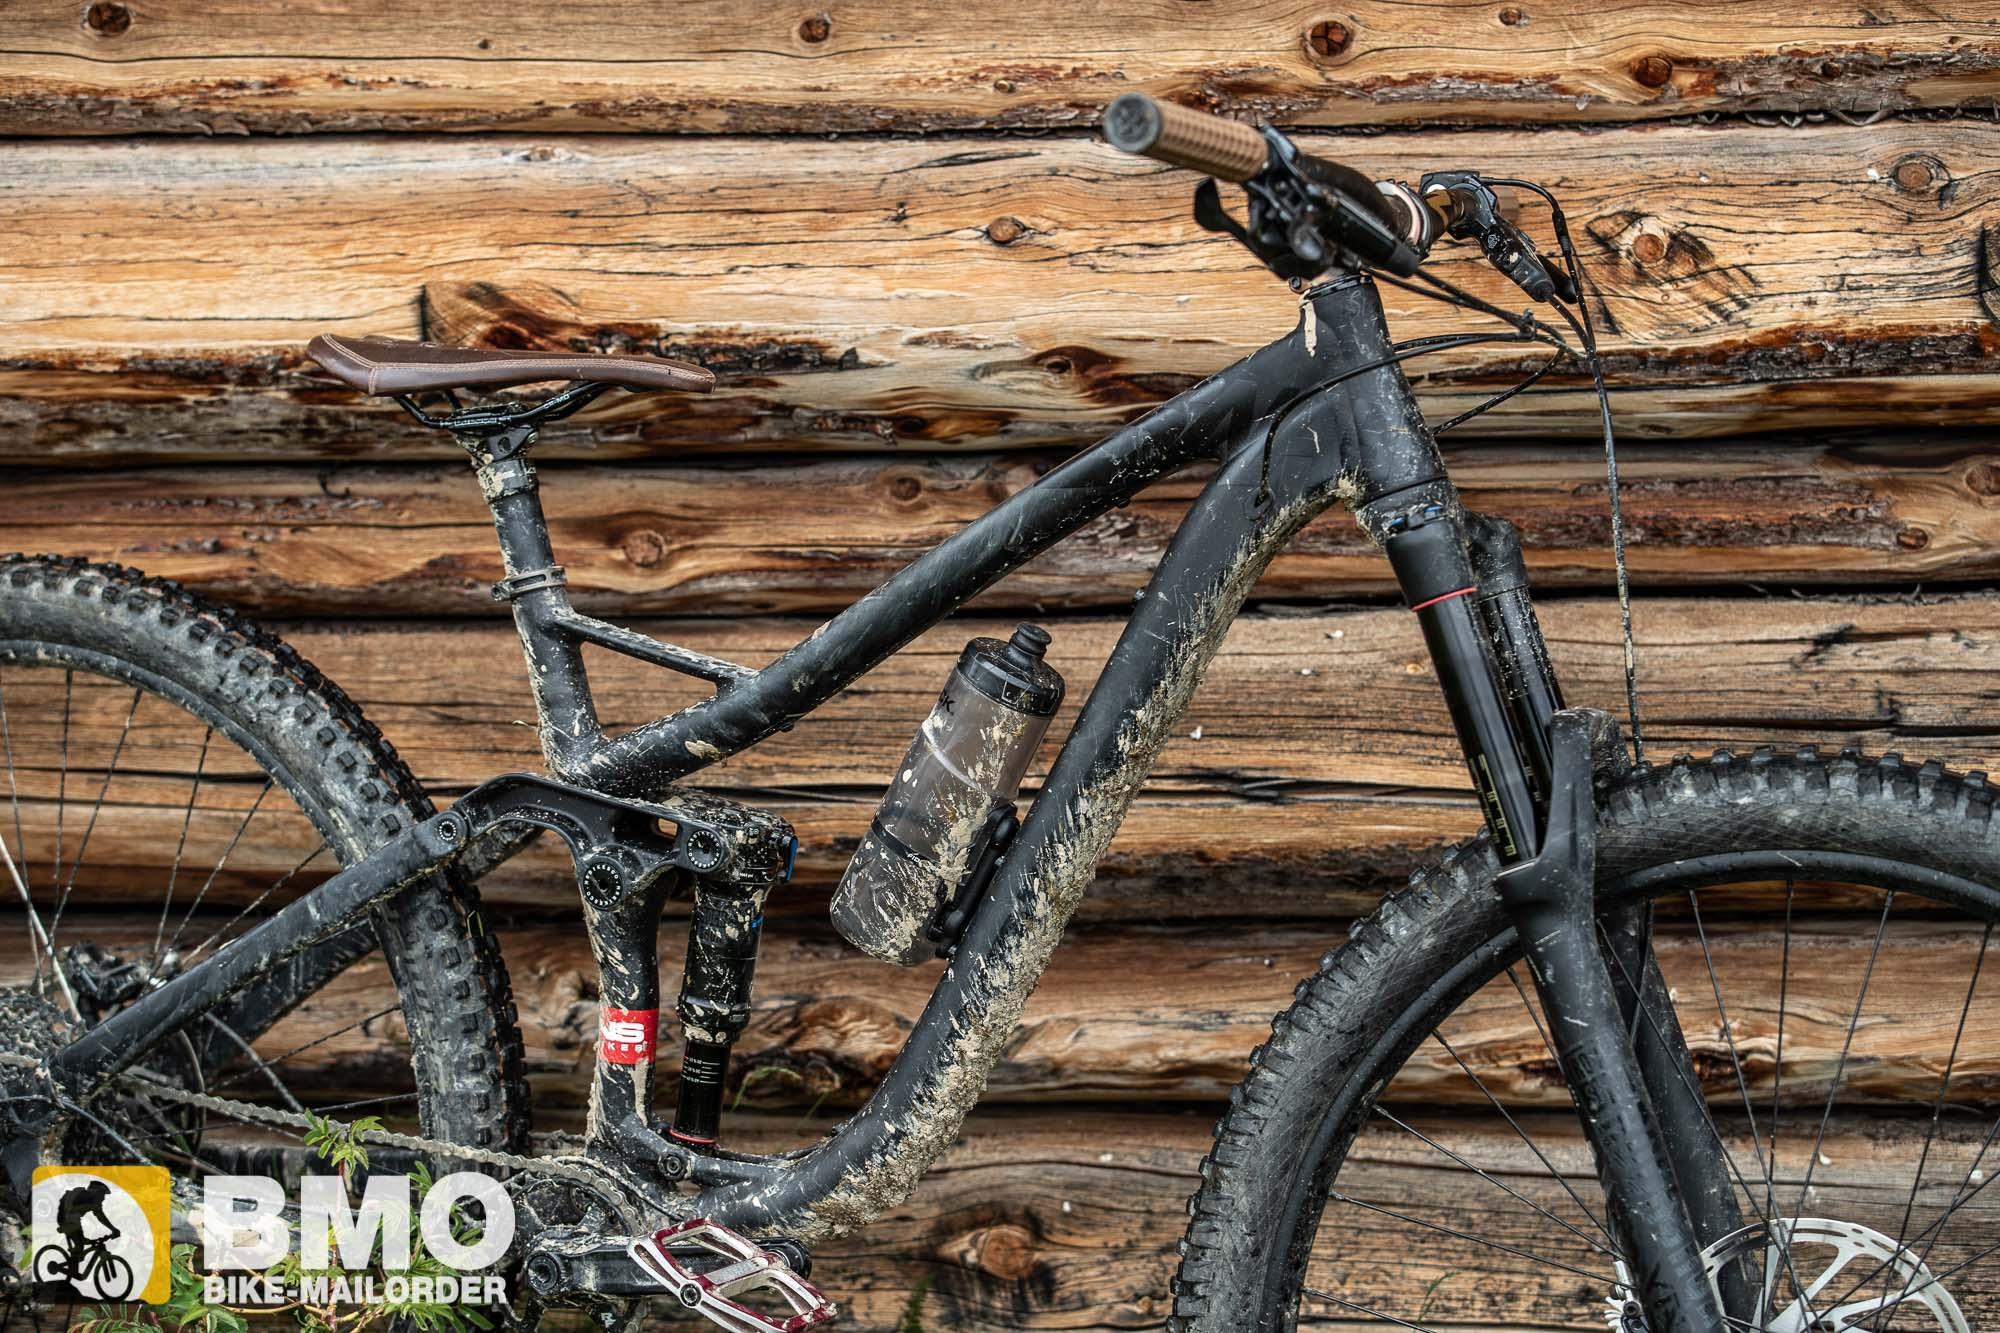 Bike-Mailorder-NS-Bikes-Snabb-150-Plus-2-Test-14